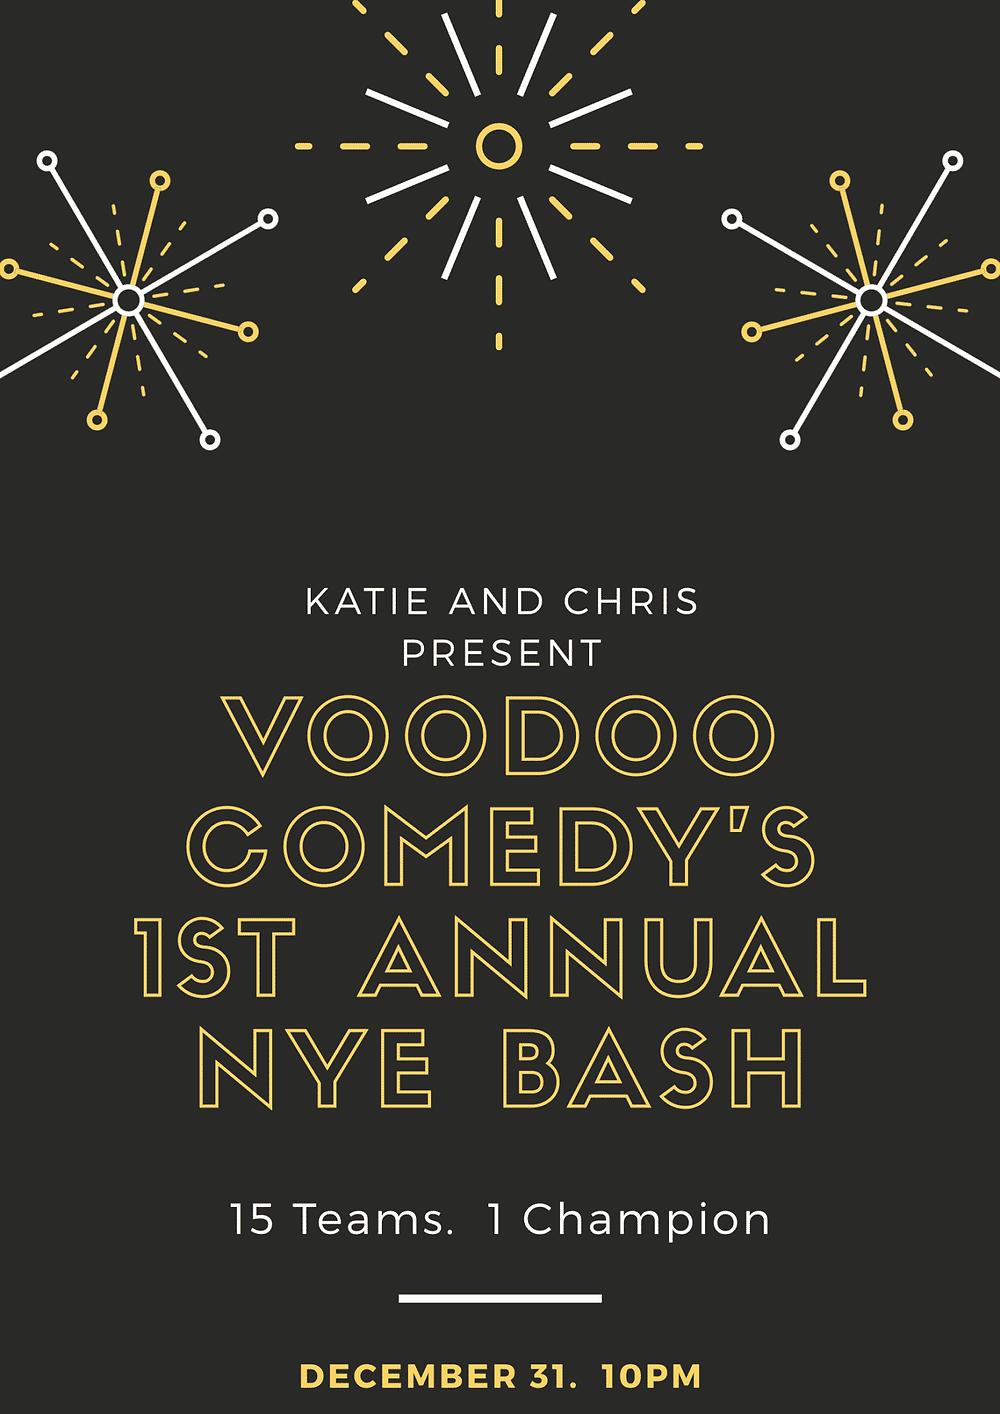 Voodoo Comedy's 1st Annual NYE Bash